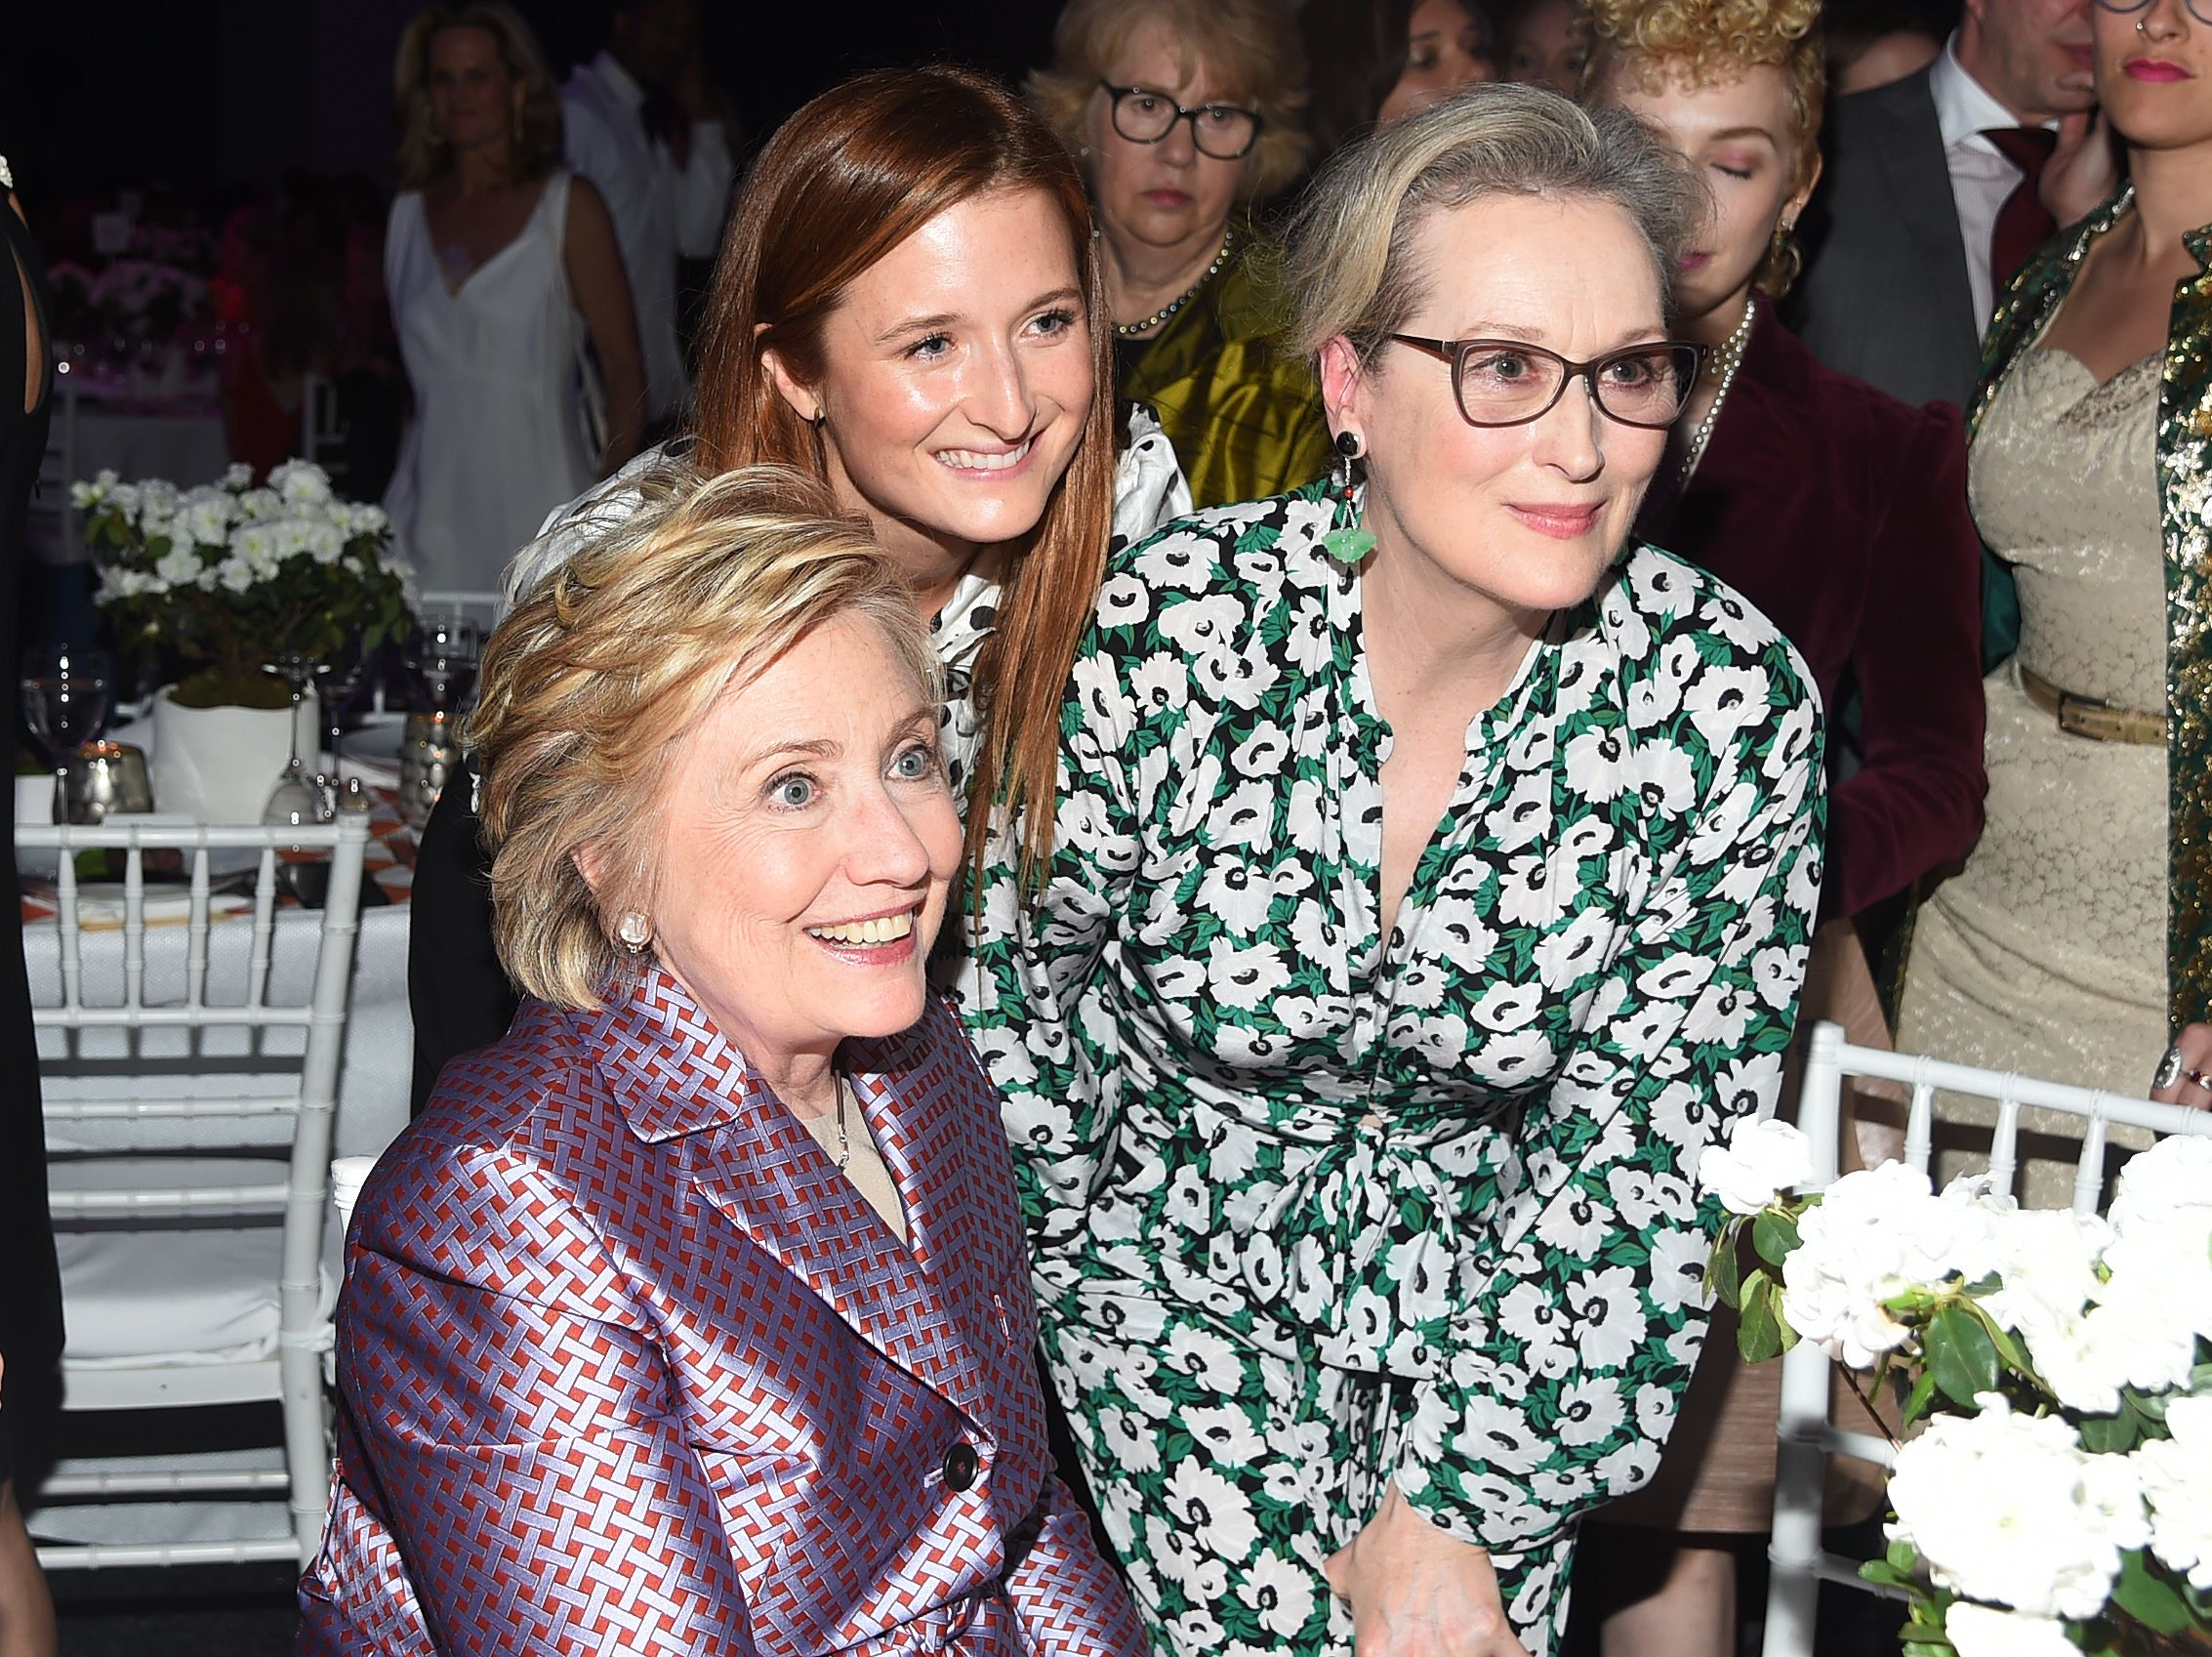 Hillary Clinton, Grace Gummer, Meryl StreepPlanned Parenthood 100th Anniversary Gala, Inside, New York, USA - 02 May 2017